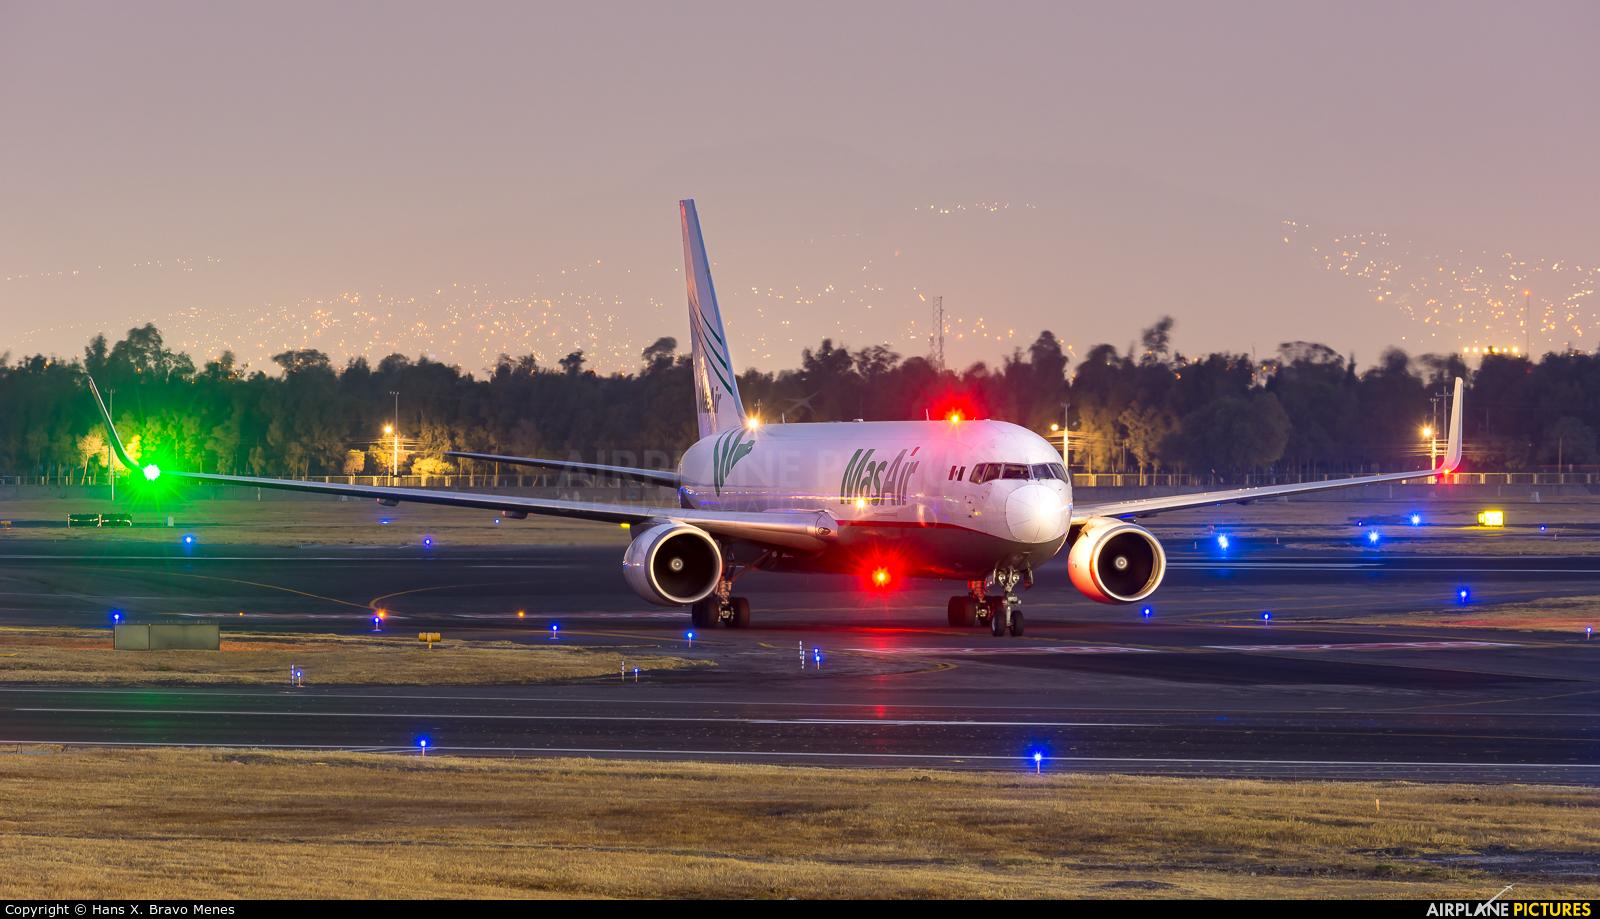 MasAir N420LA aircraft at Mexico City - Licenciado Benito Juarez Intl